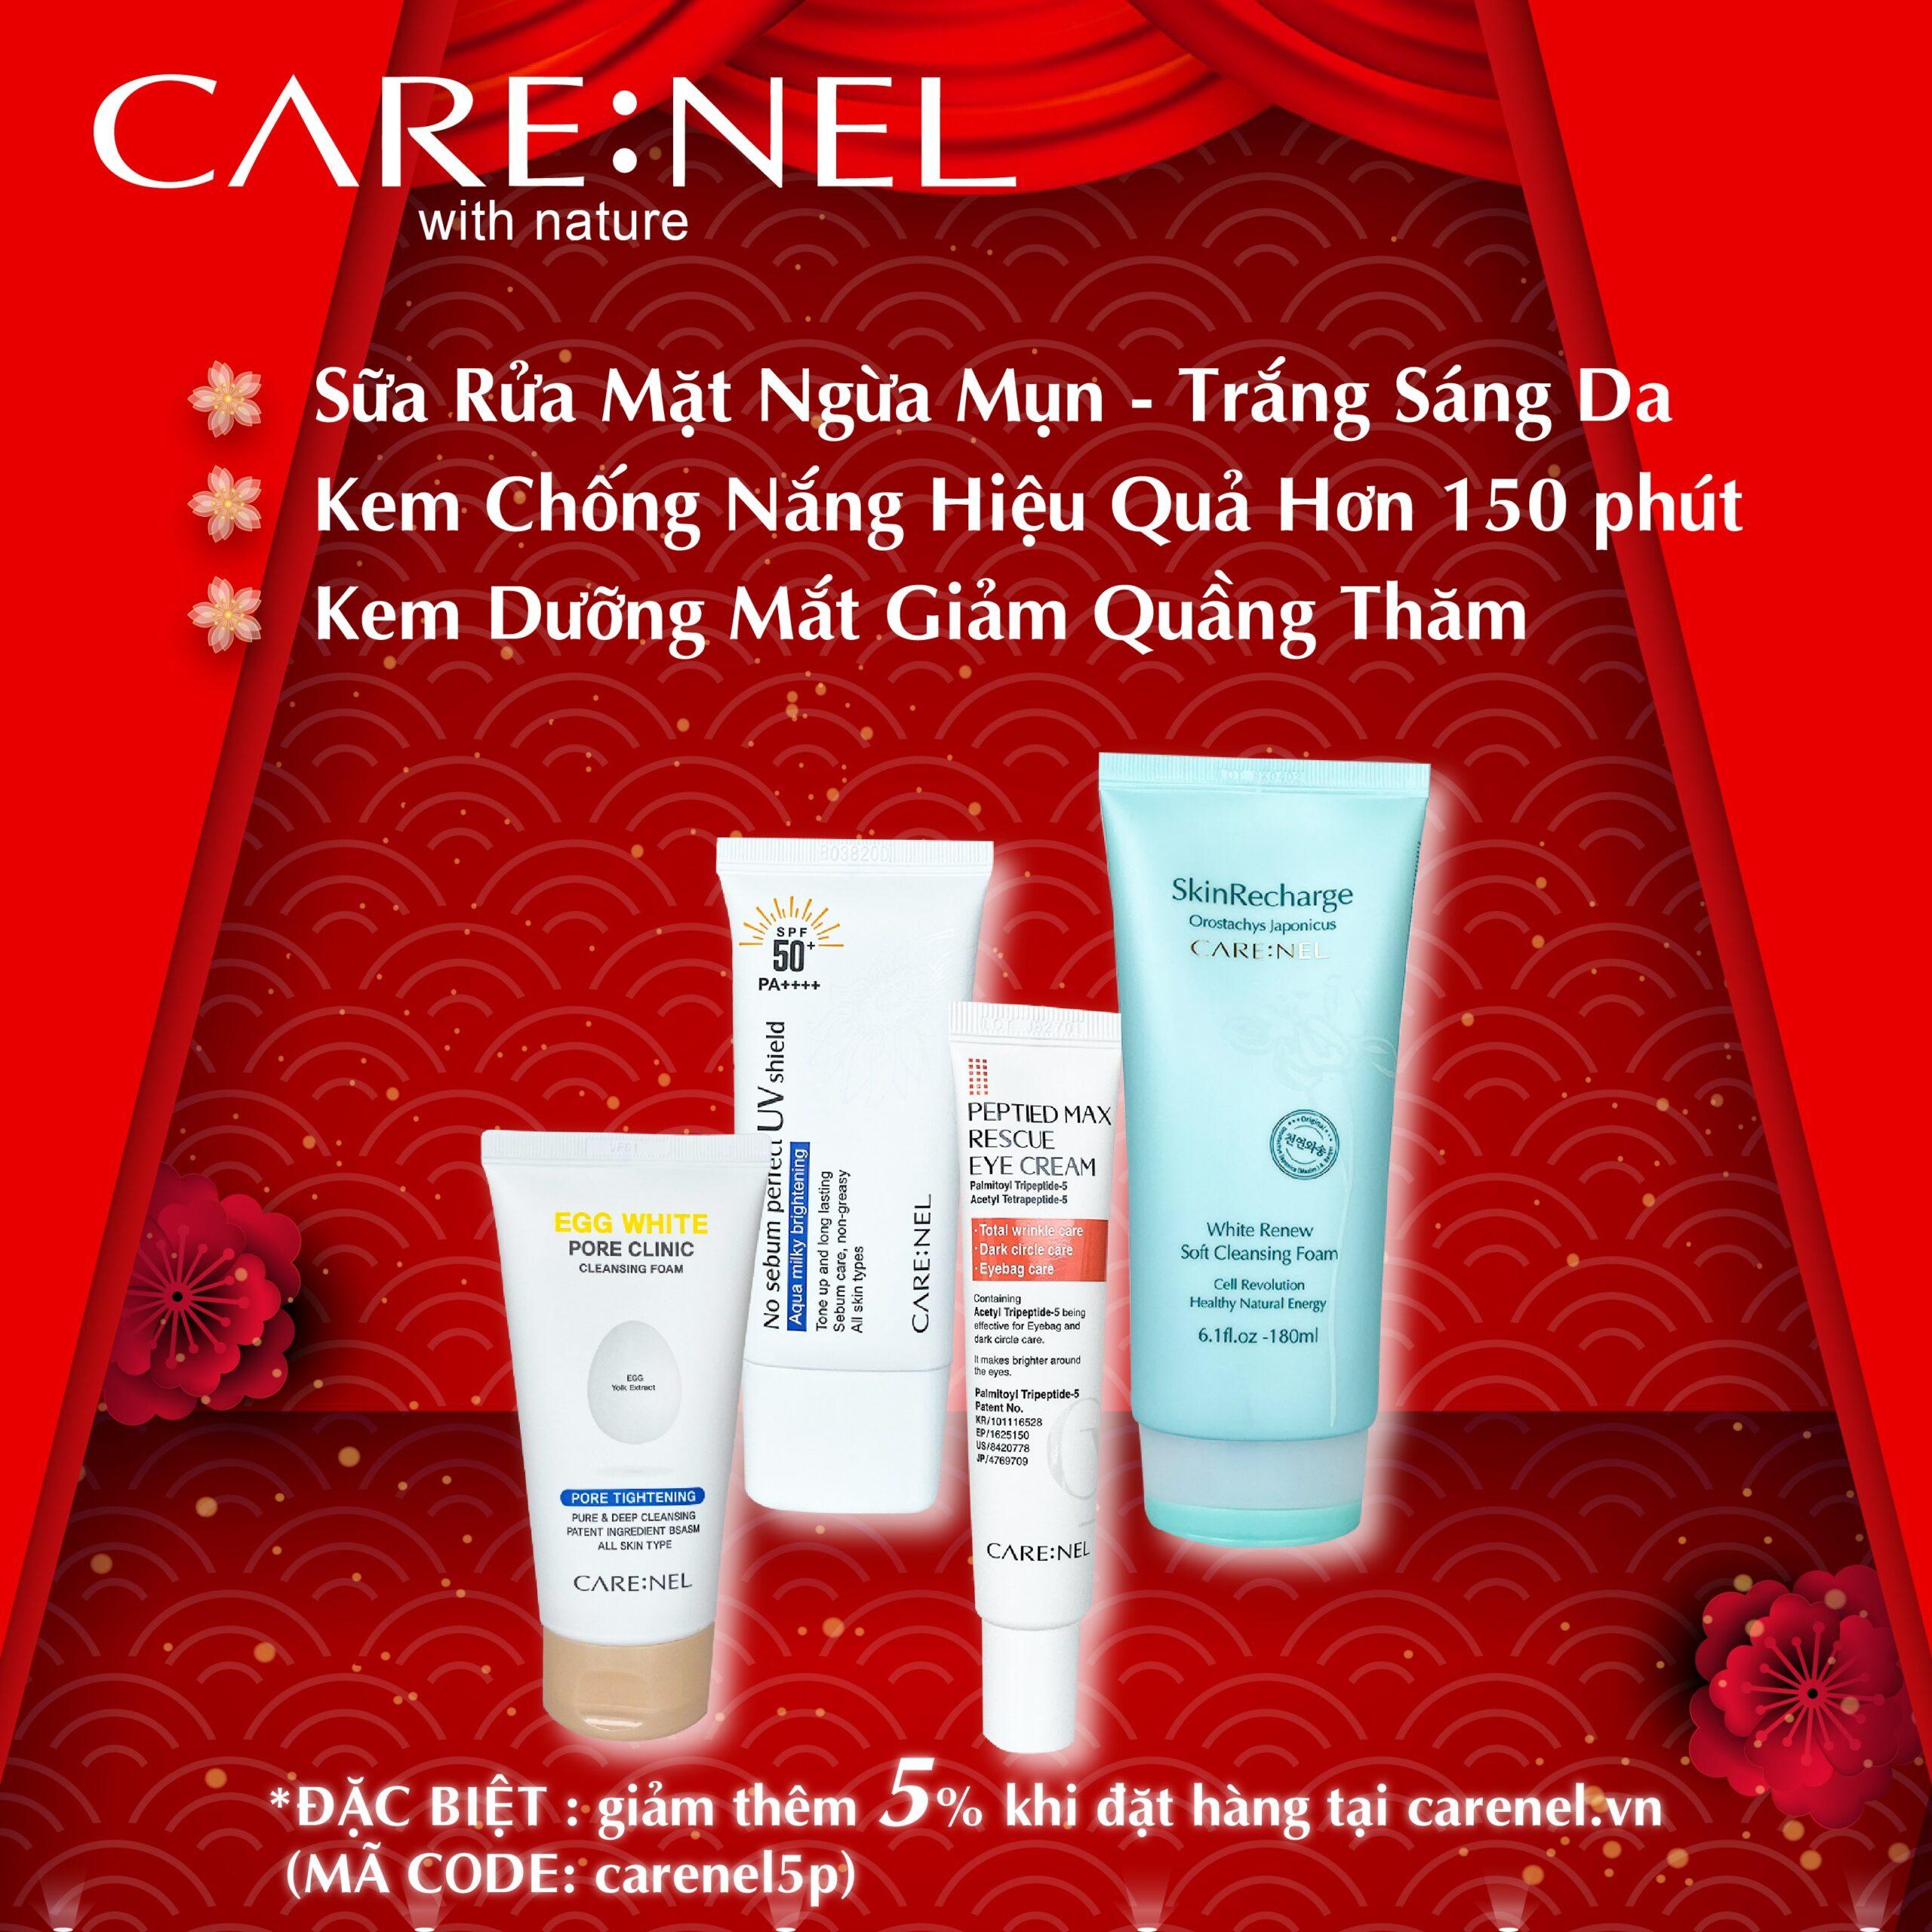 Chuong Trinh Uu Dai Hpny 2021 Carenel 2